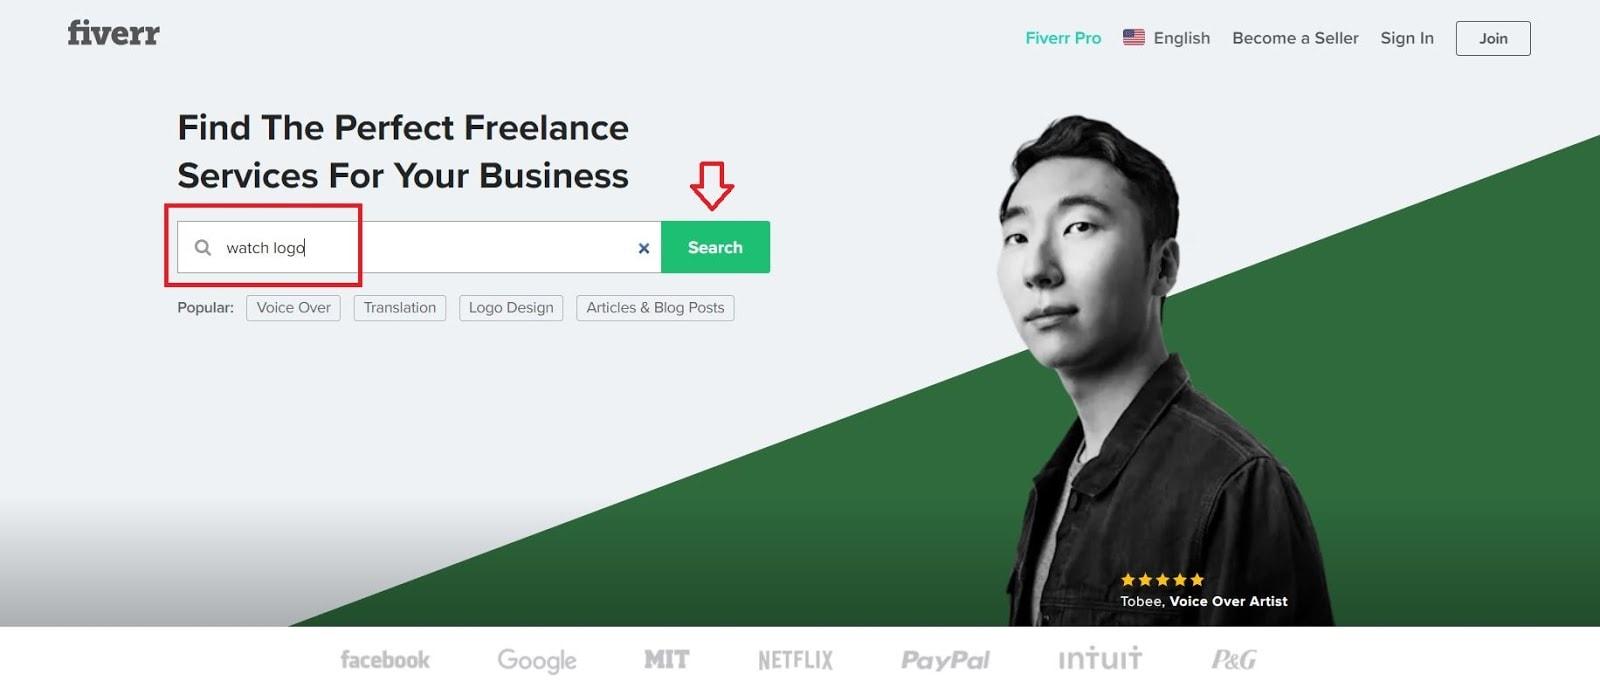 Fiverr screenshot - Homepage search bar